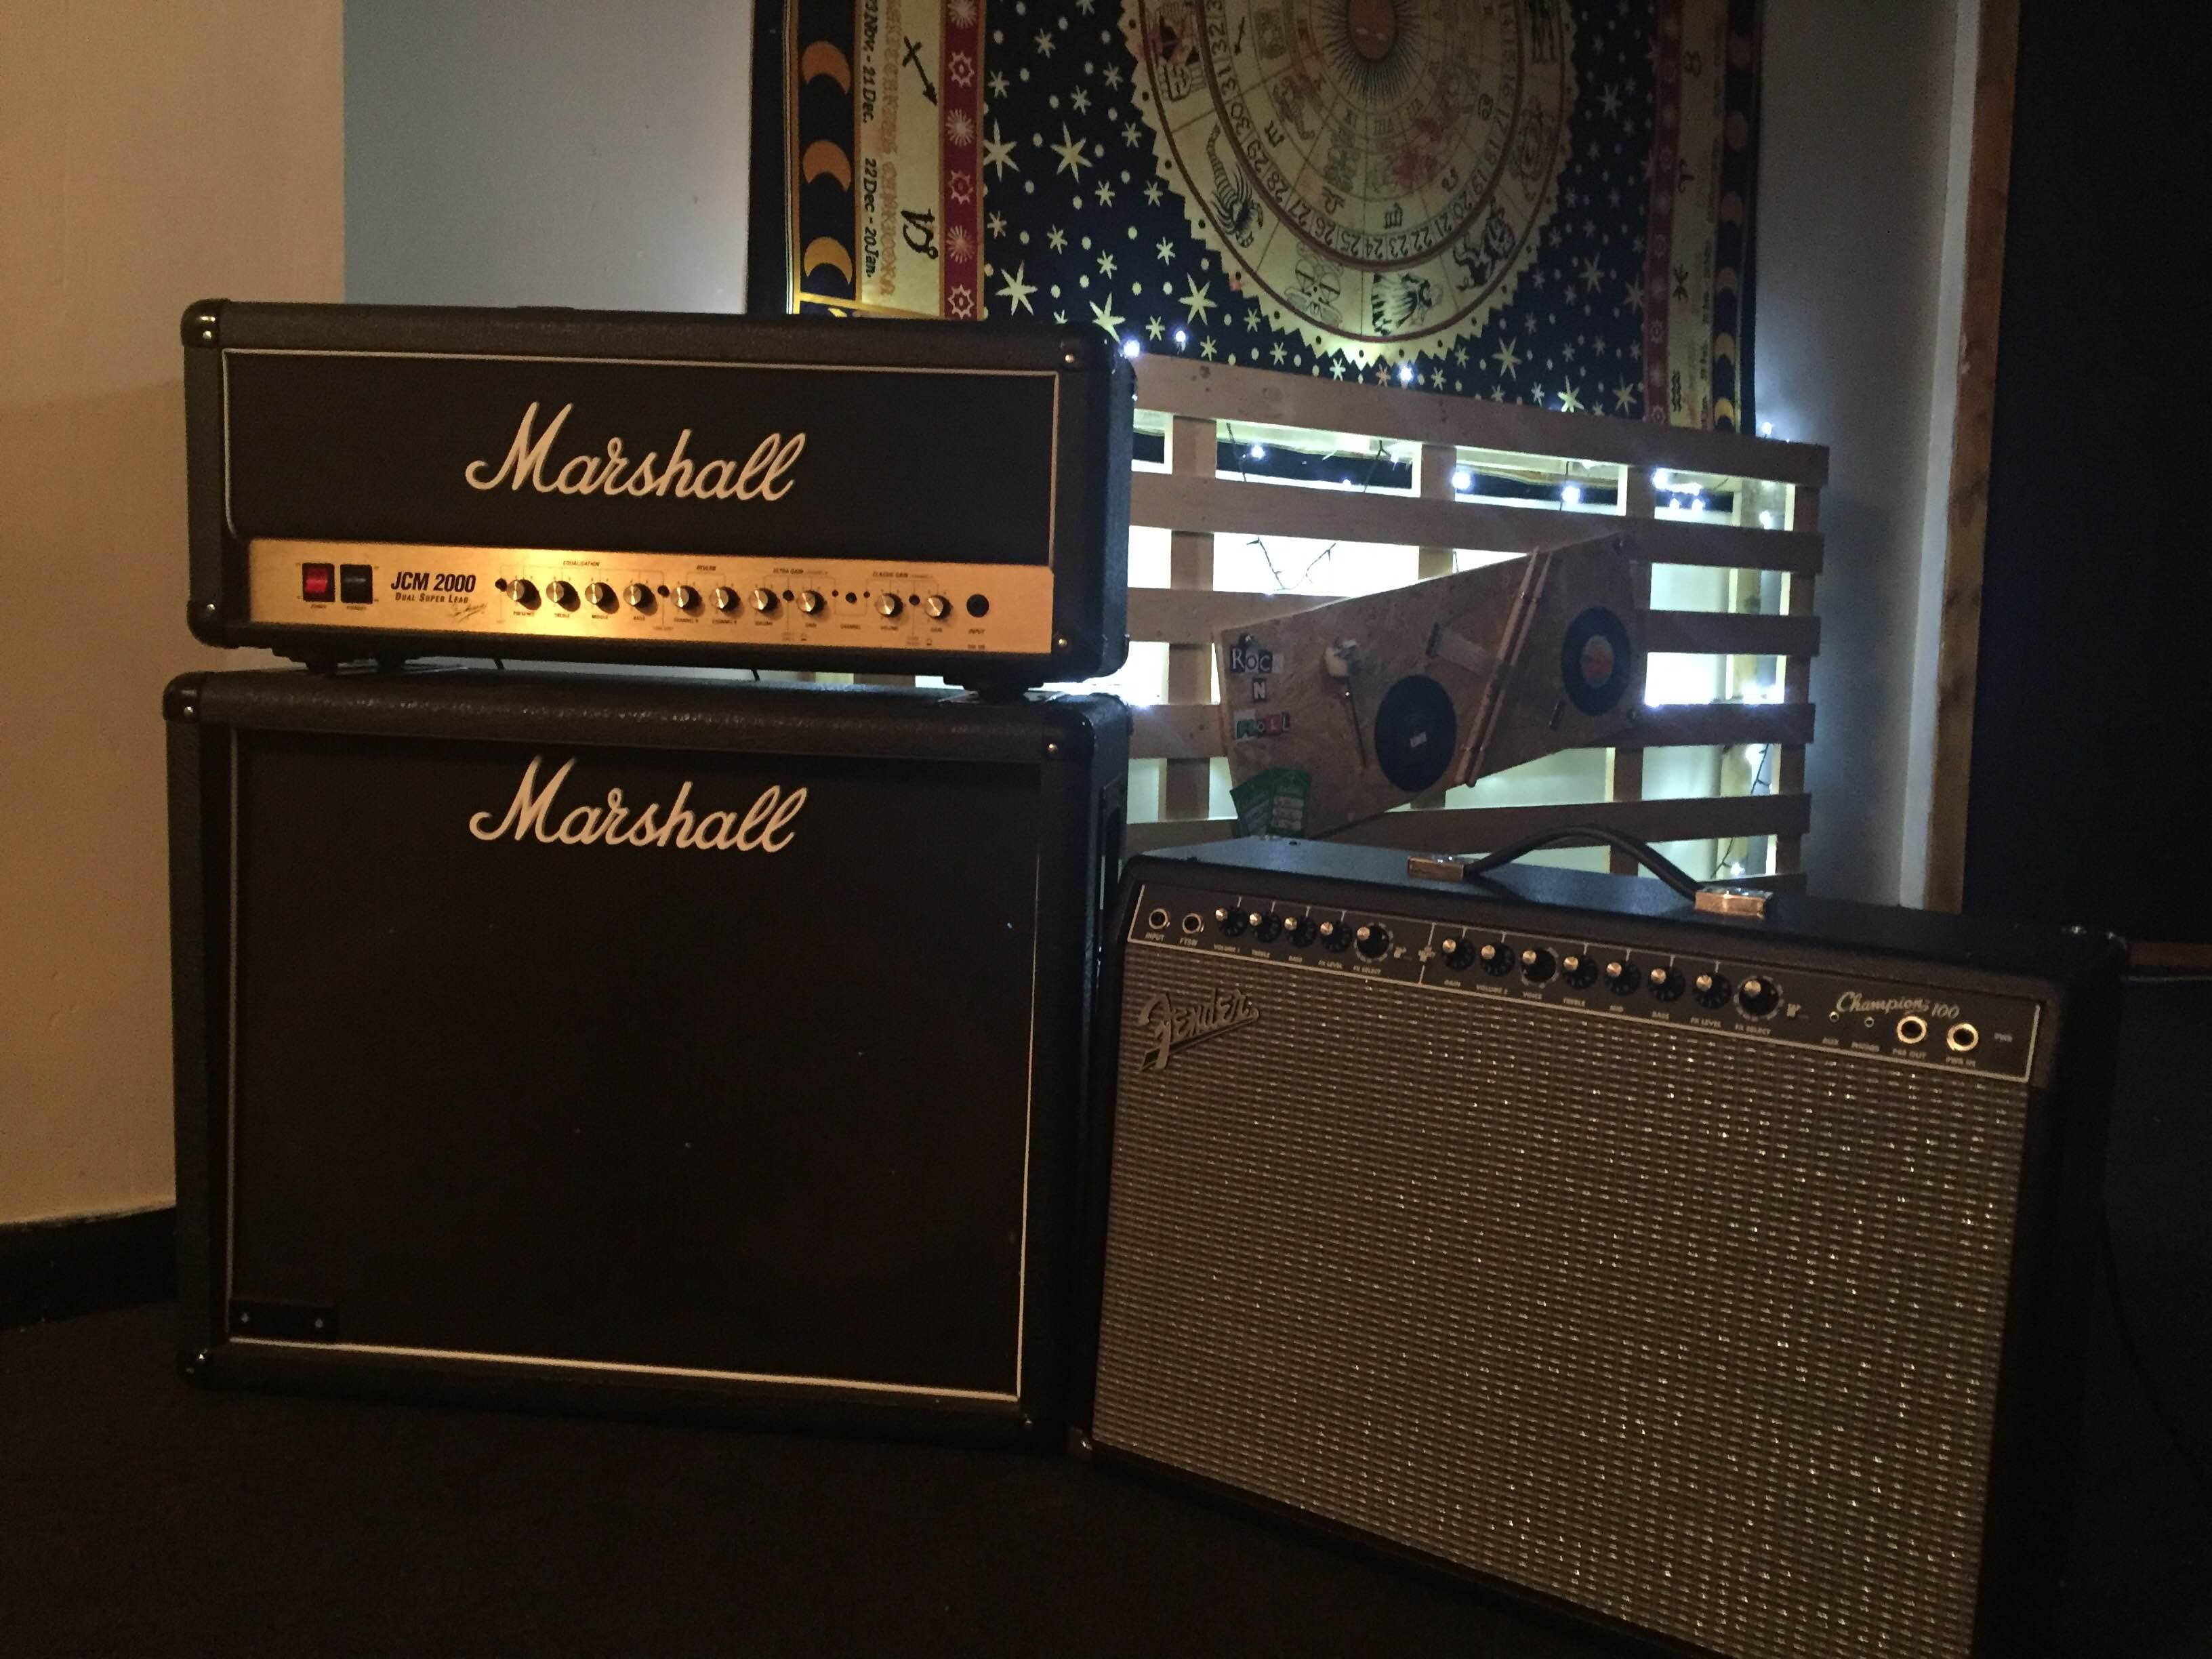 Marshall & Fender